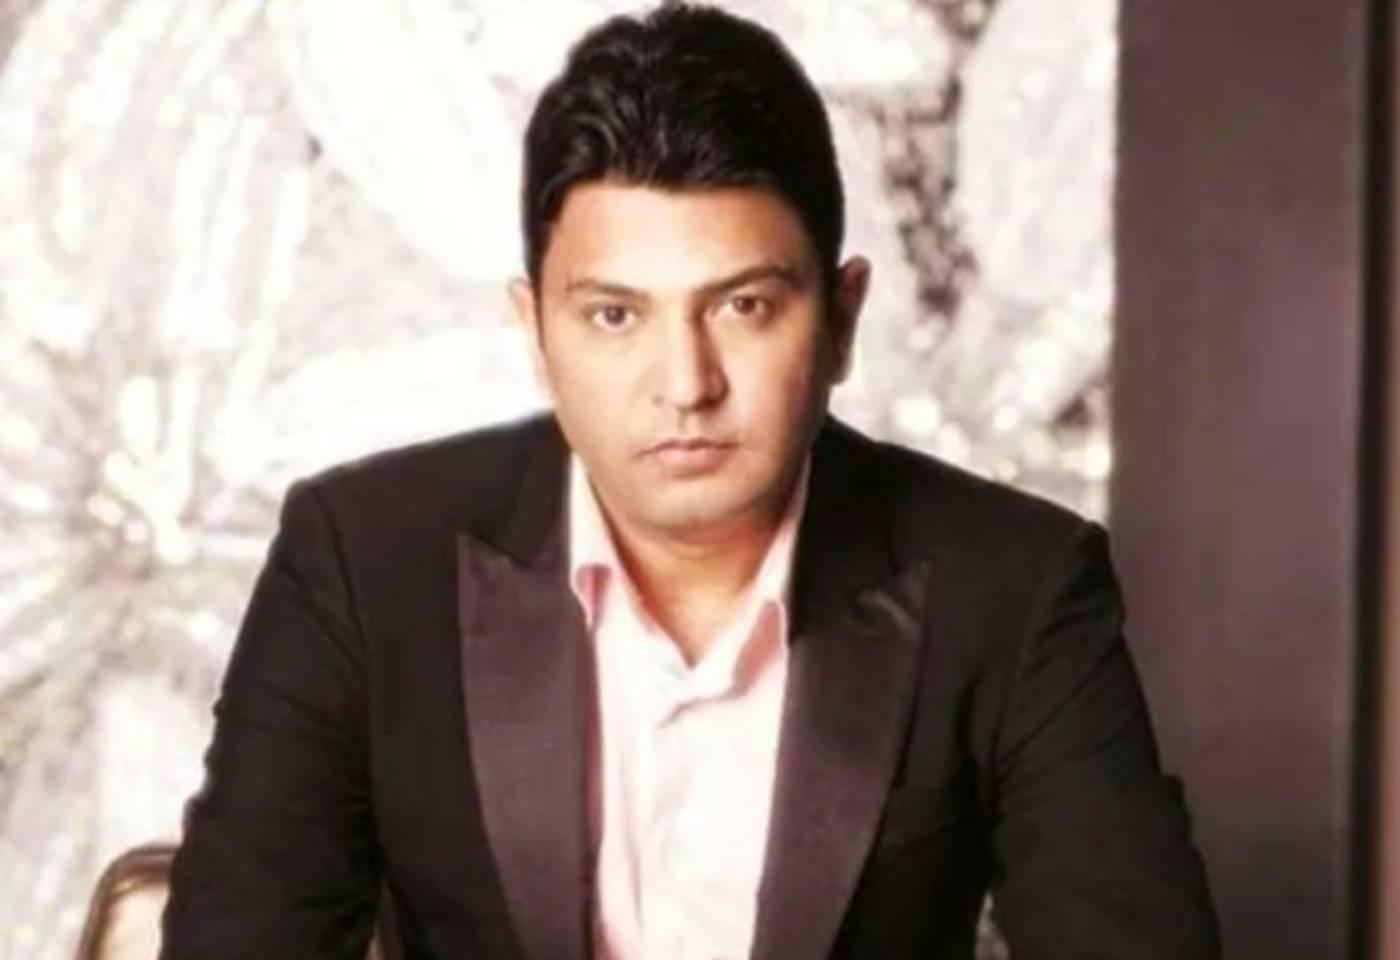 rape case filed against t series managing director bhushan kumar in Mumbai